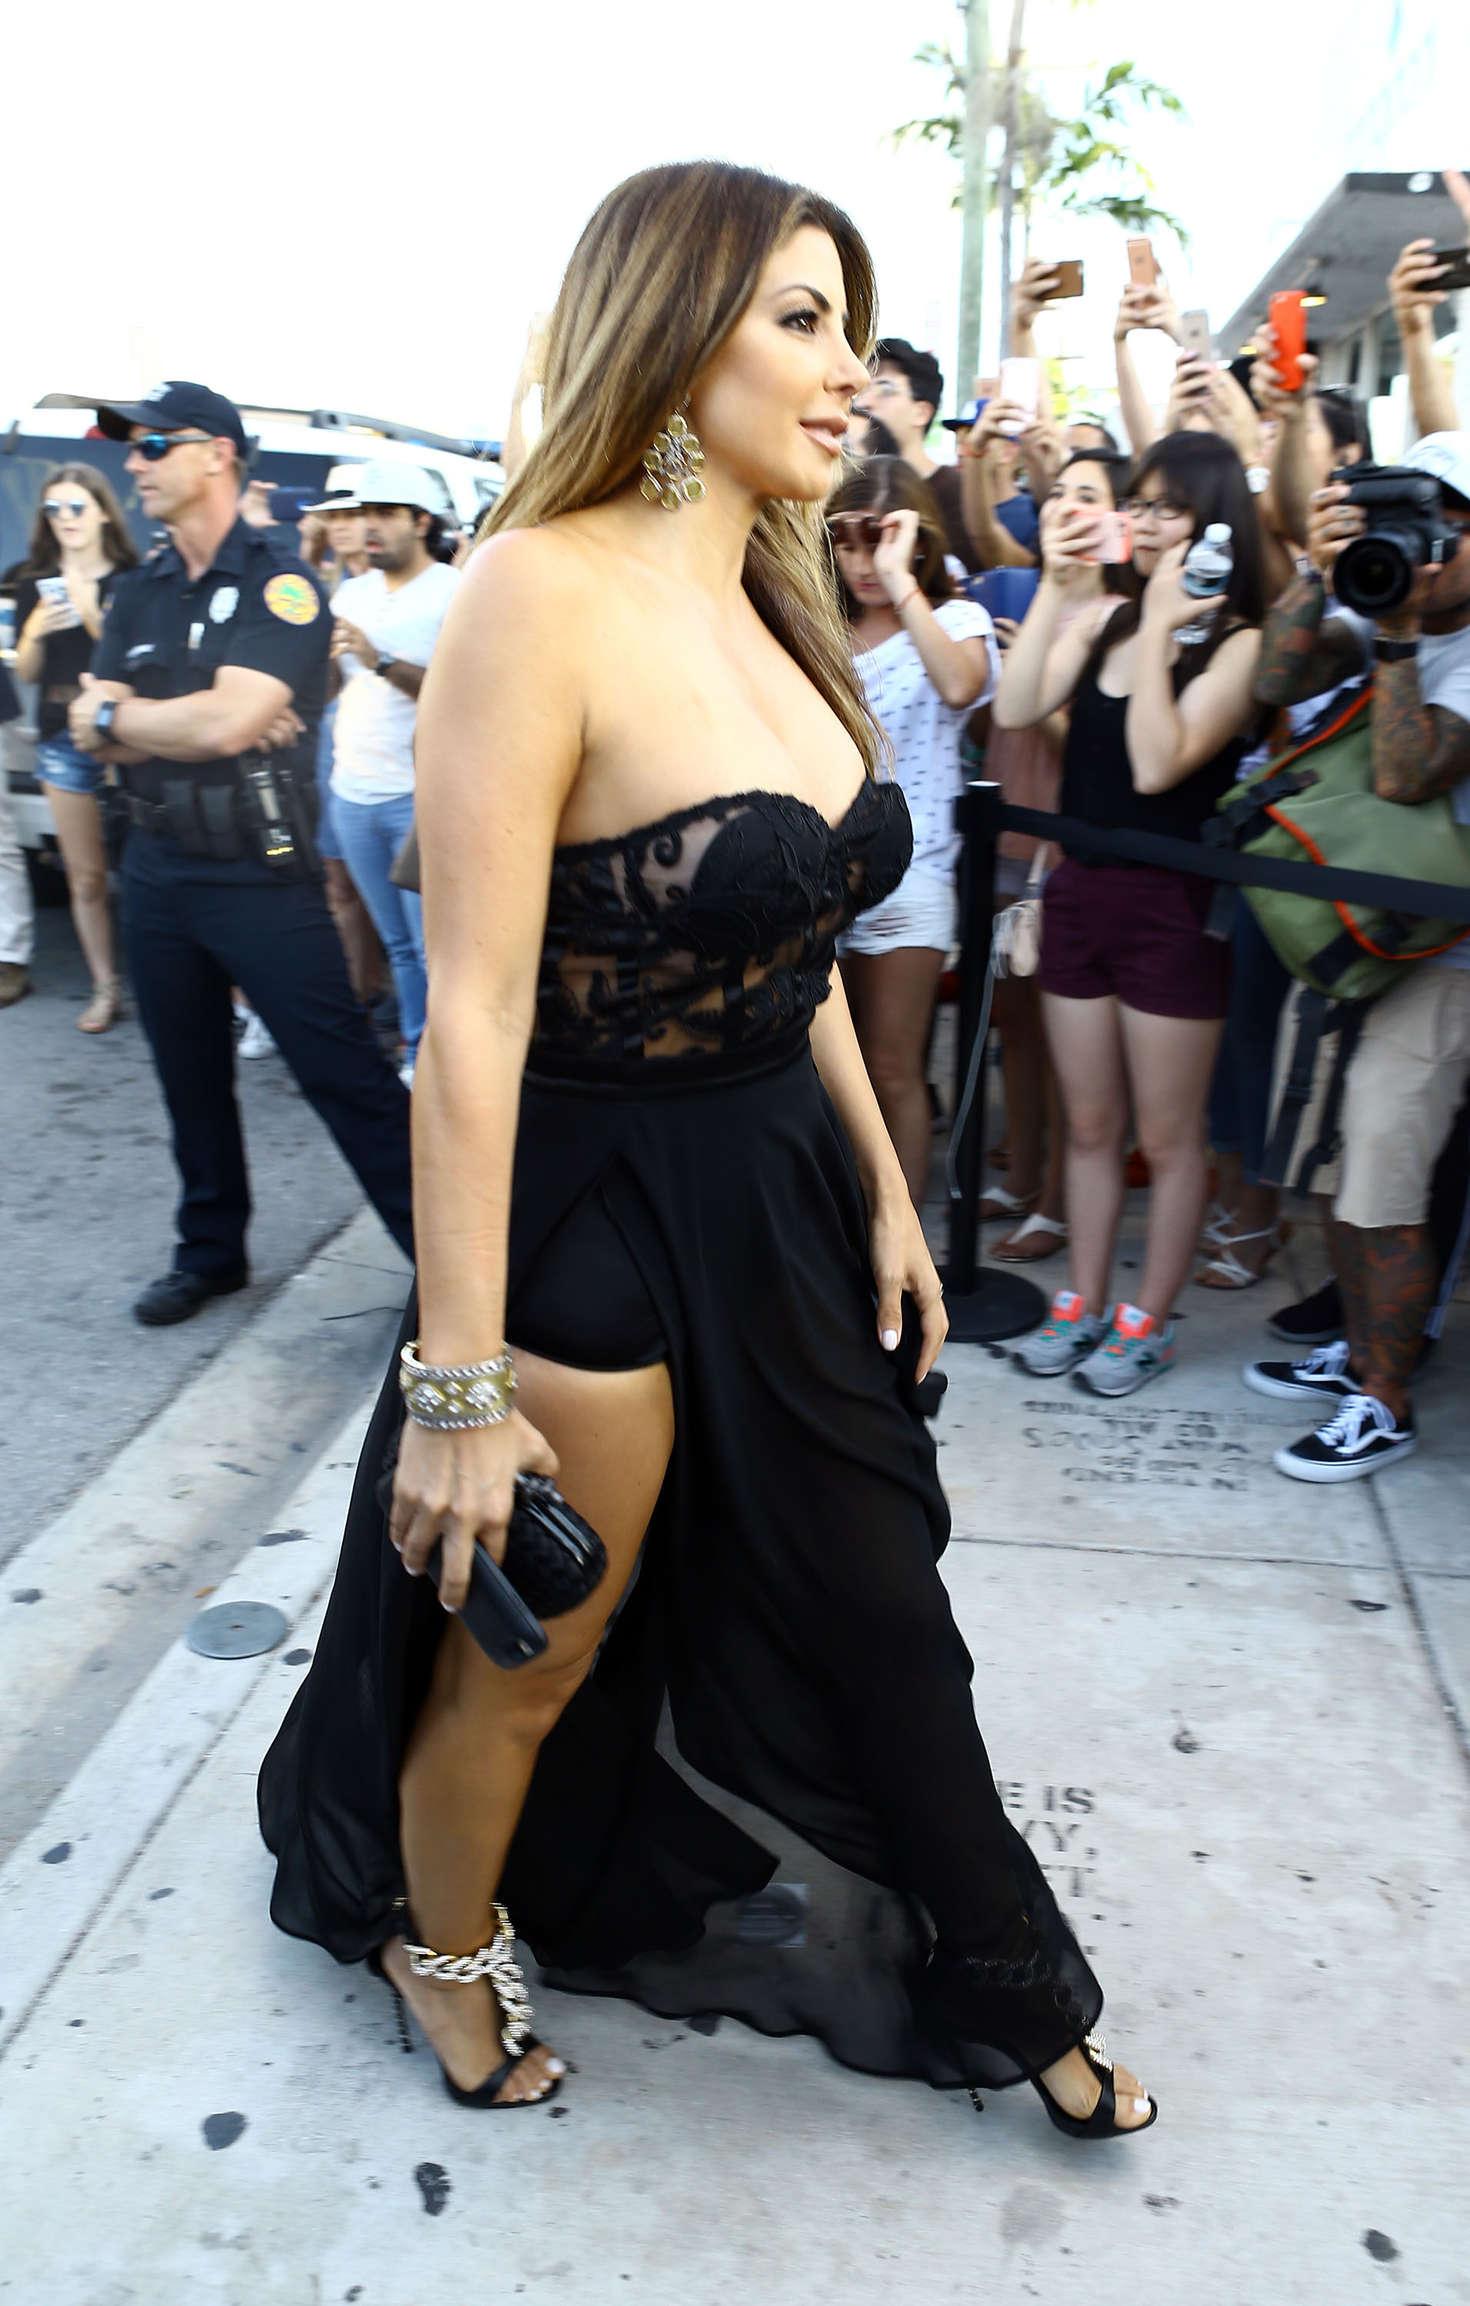 2019 Isabela Rangel nudes (69 photo), Sexy, Leaked, Twitter, butt 2020